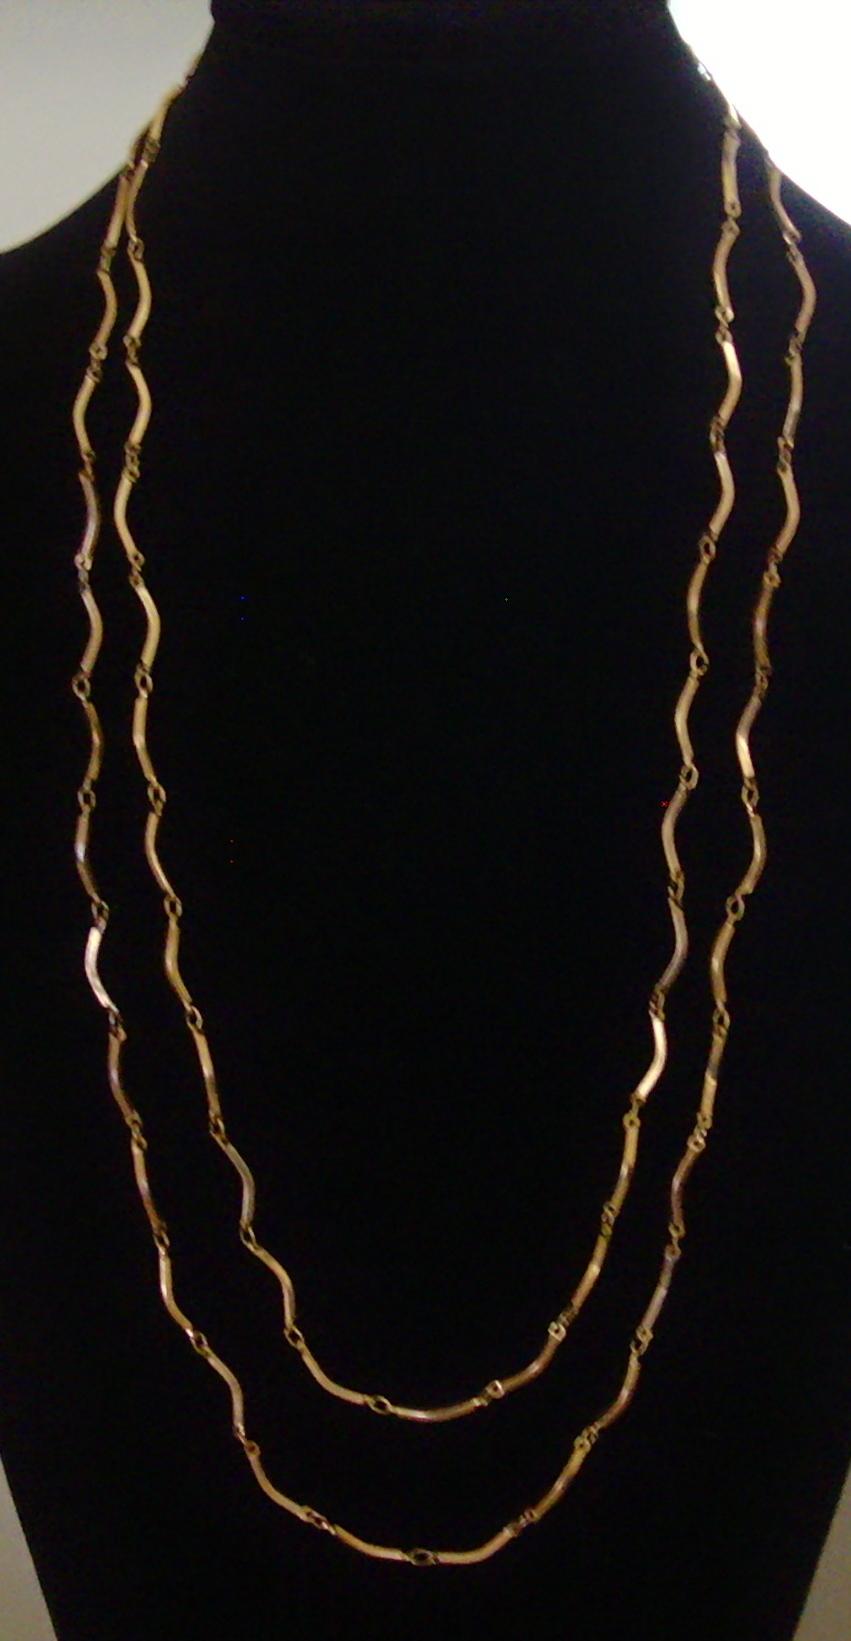 Double Strand Gold-Tone Tubular Link Necklace